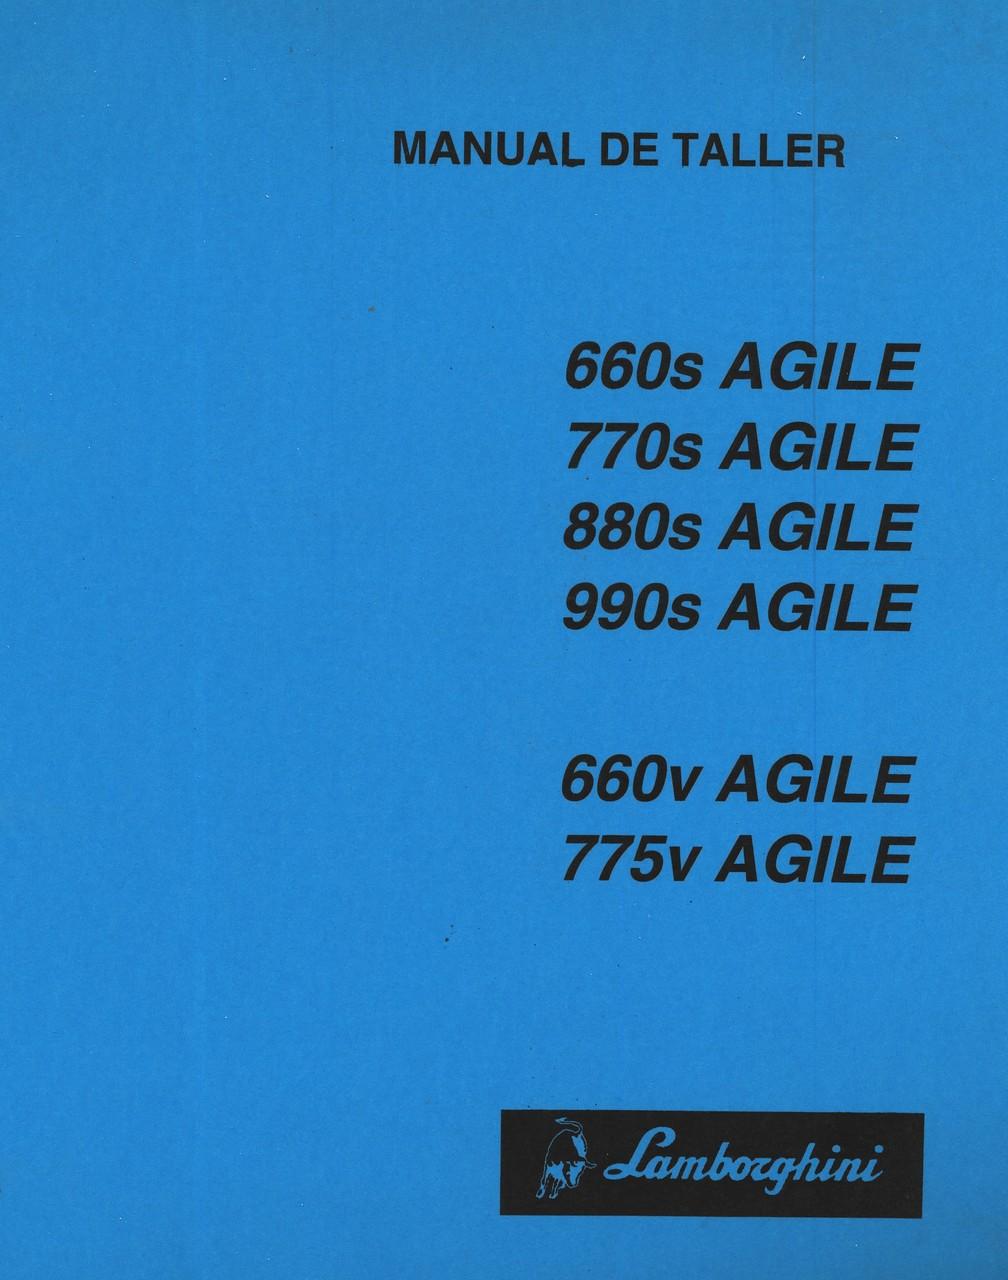 660s AGILE - 770s AGILE - 880s AGILE - 990s AGILE - 660v AGILE - 775V AGILE - Manual de taller